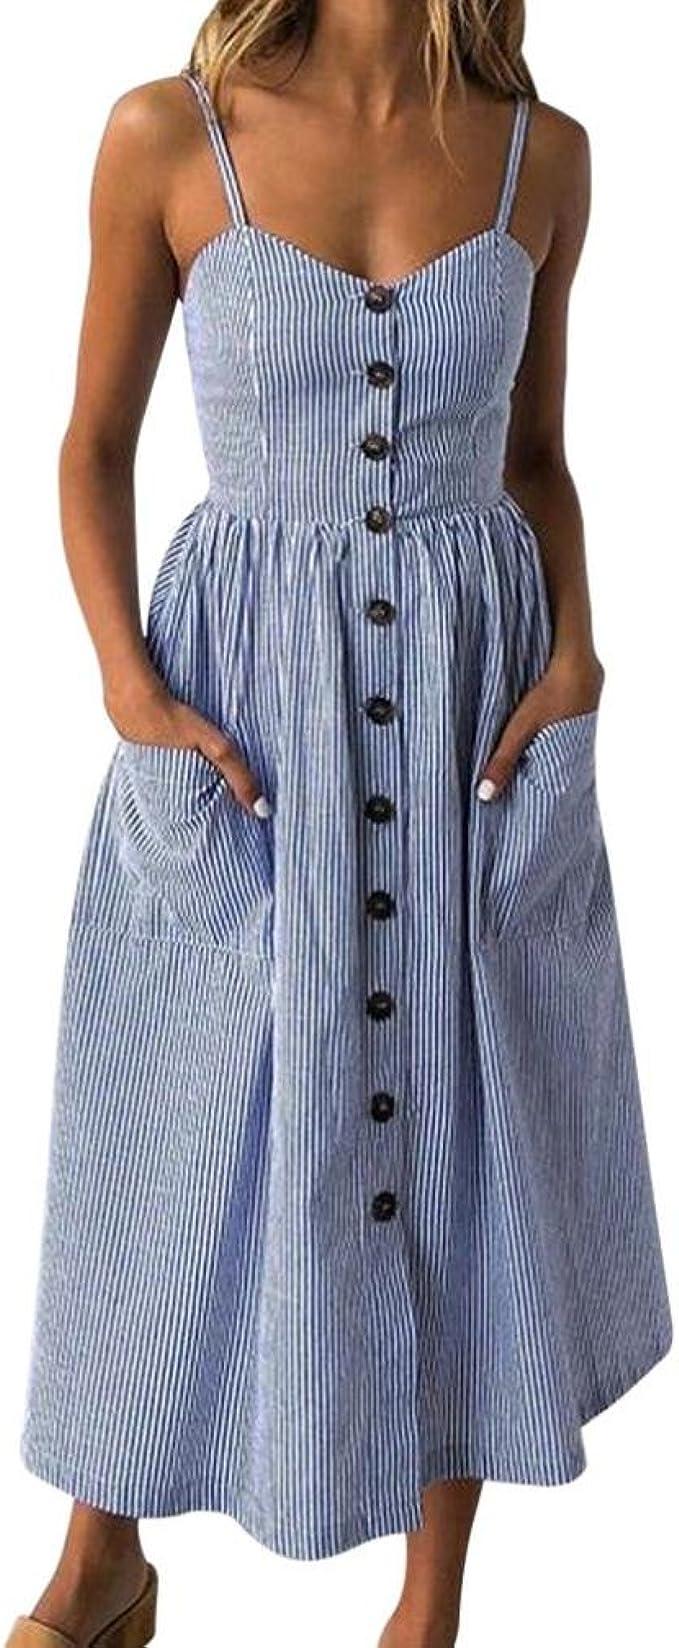 Womens Floral Casual Sundress Summer Ladies Button Pocket Beach Midi Swing Dress